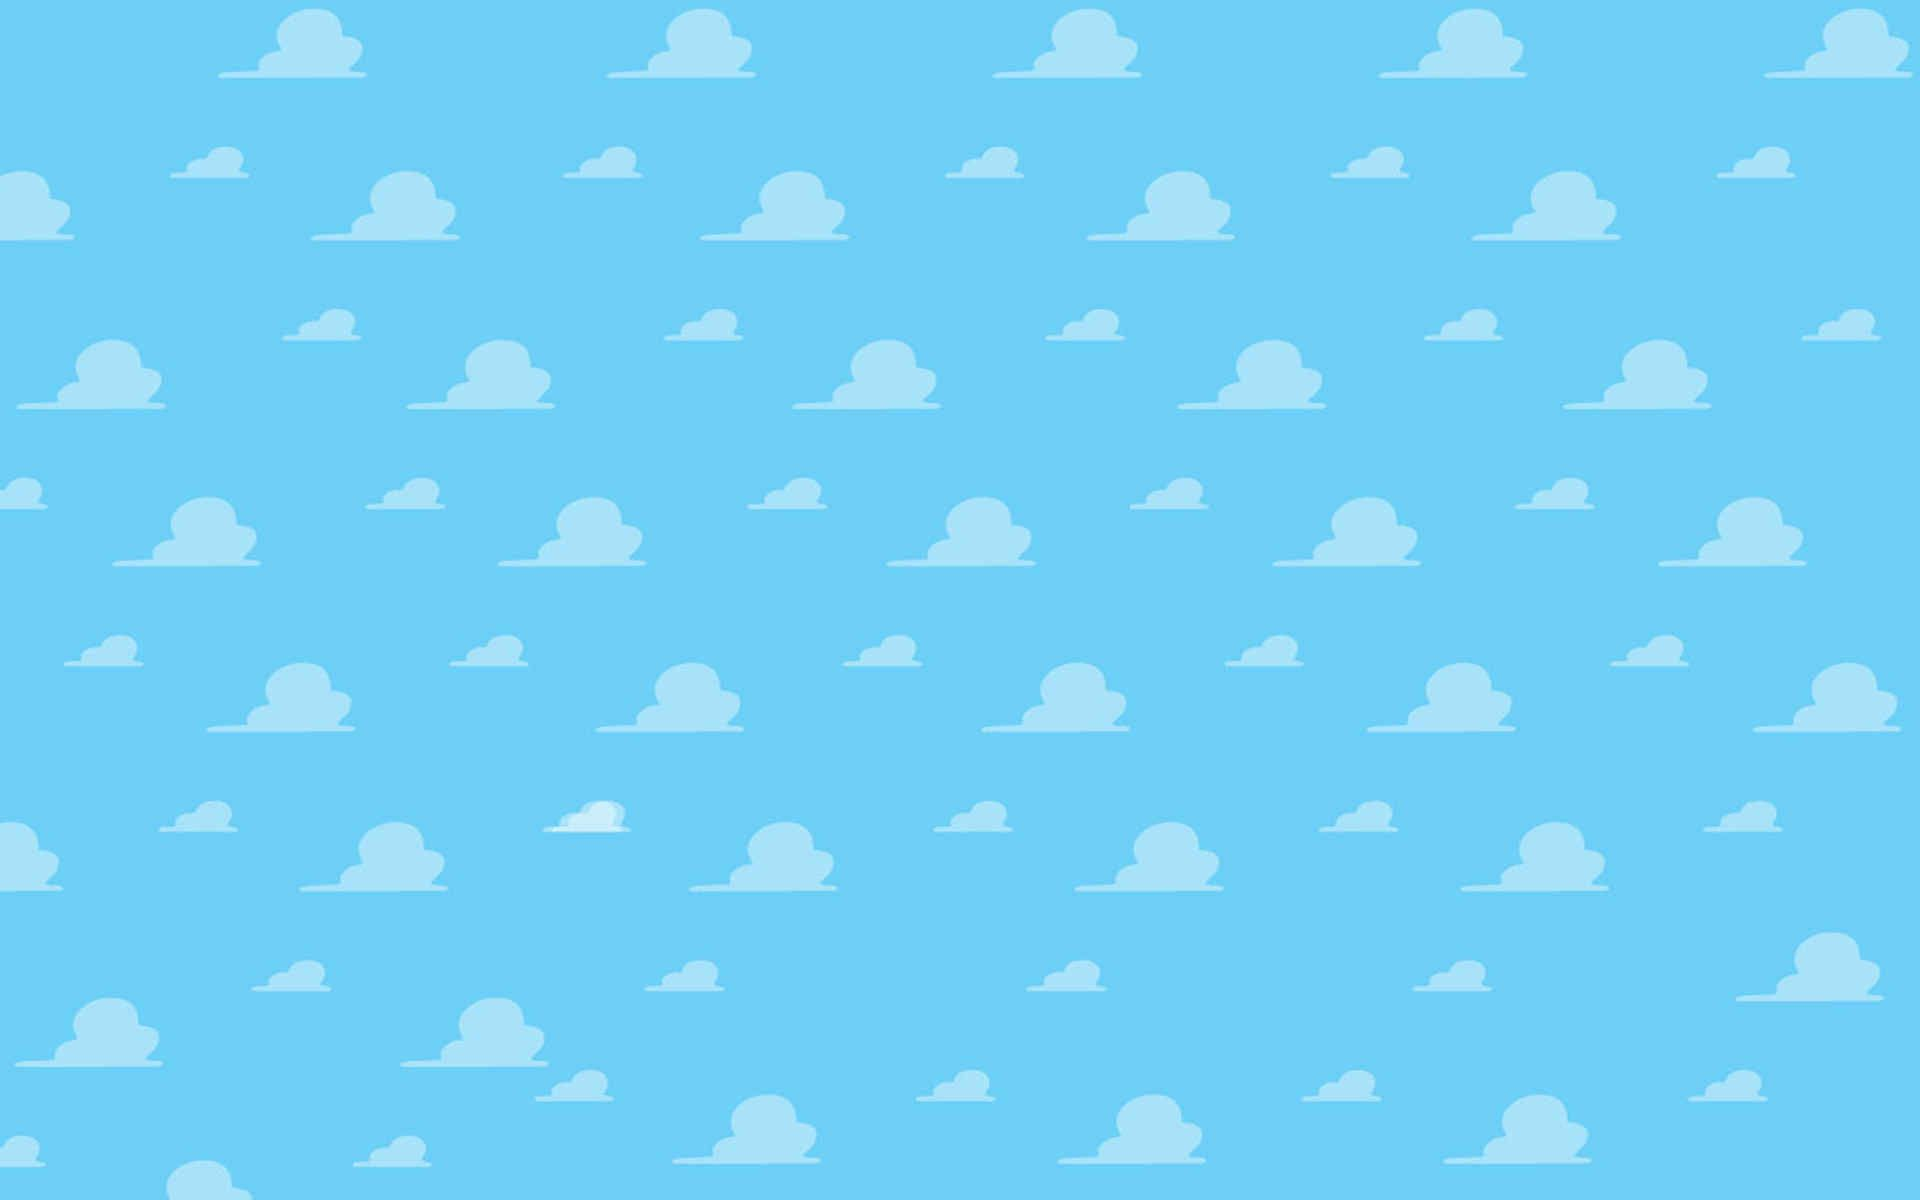 Toy Story Cloud Wallpaper, Desktop 4K Full HD Images